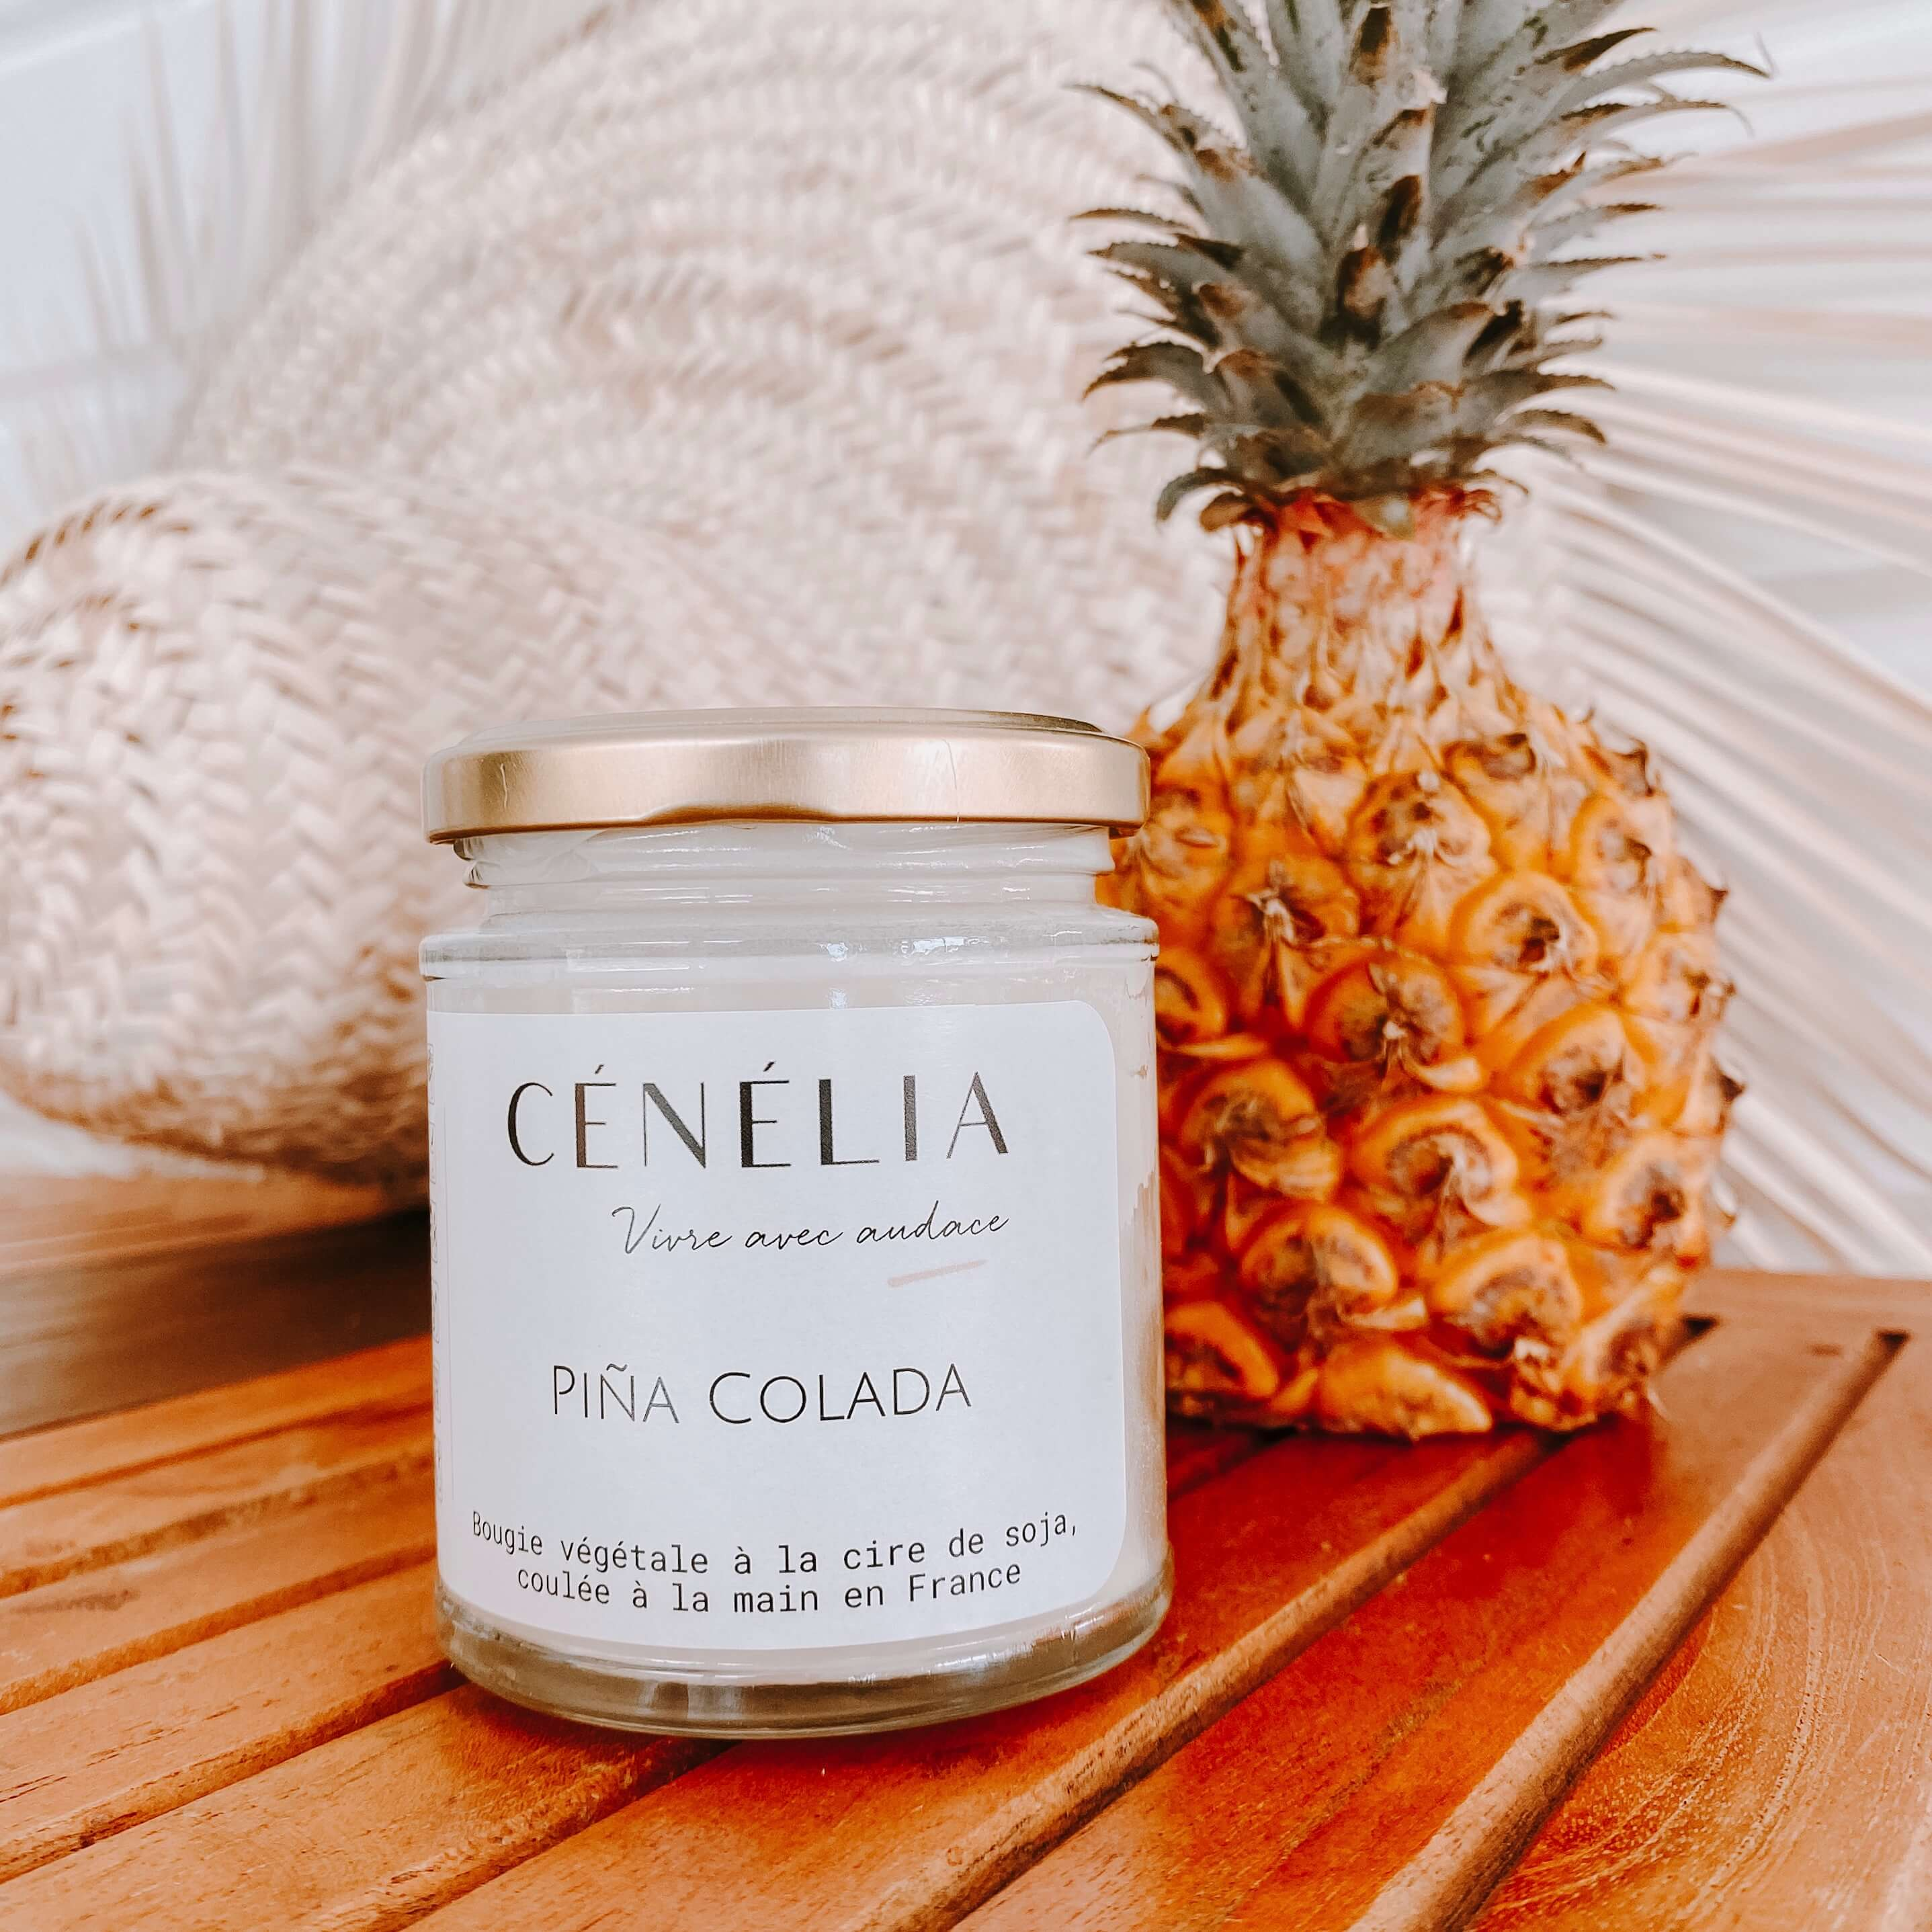 Bougie naturelle à l'ananas - Piña Colada Cénélia